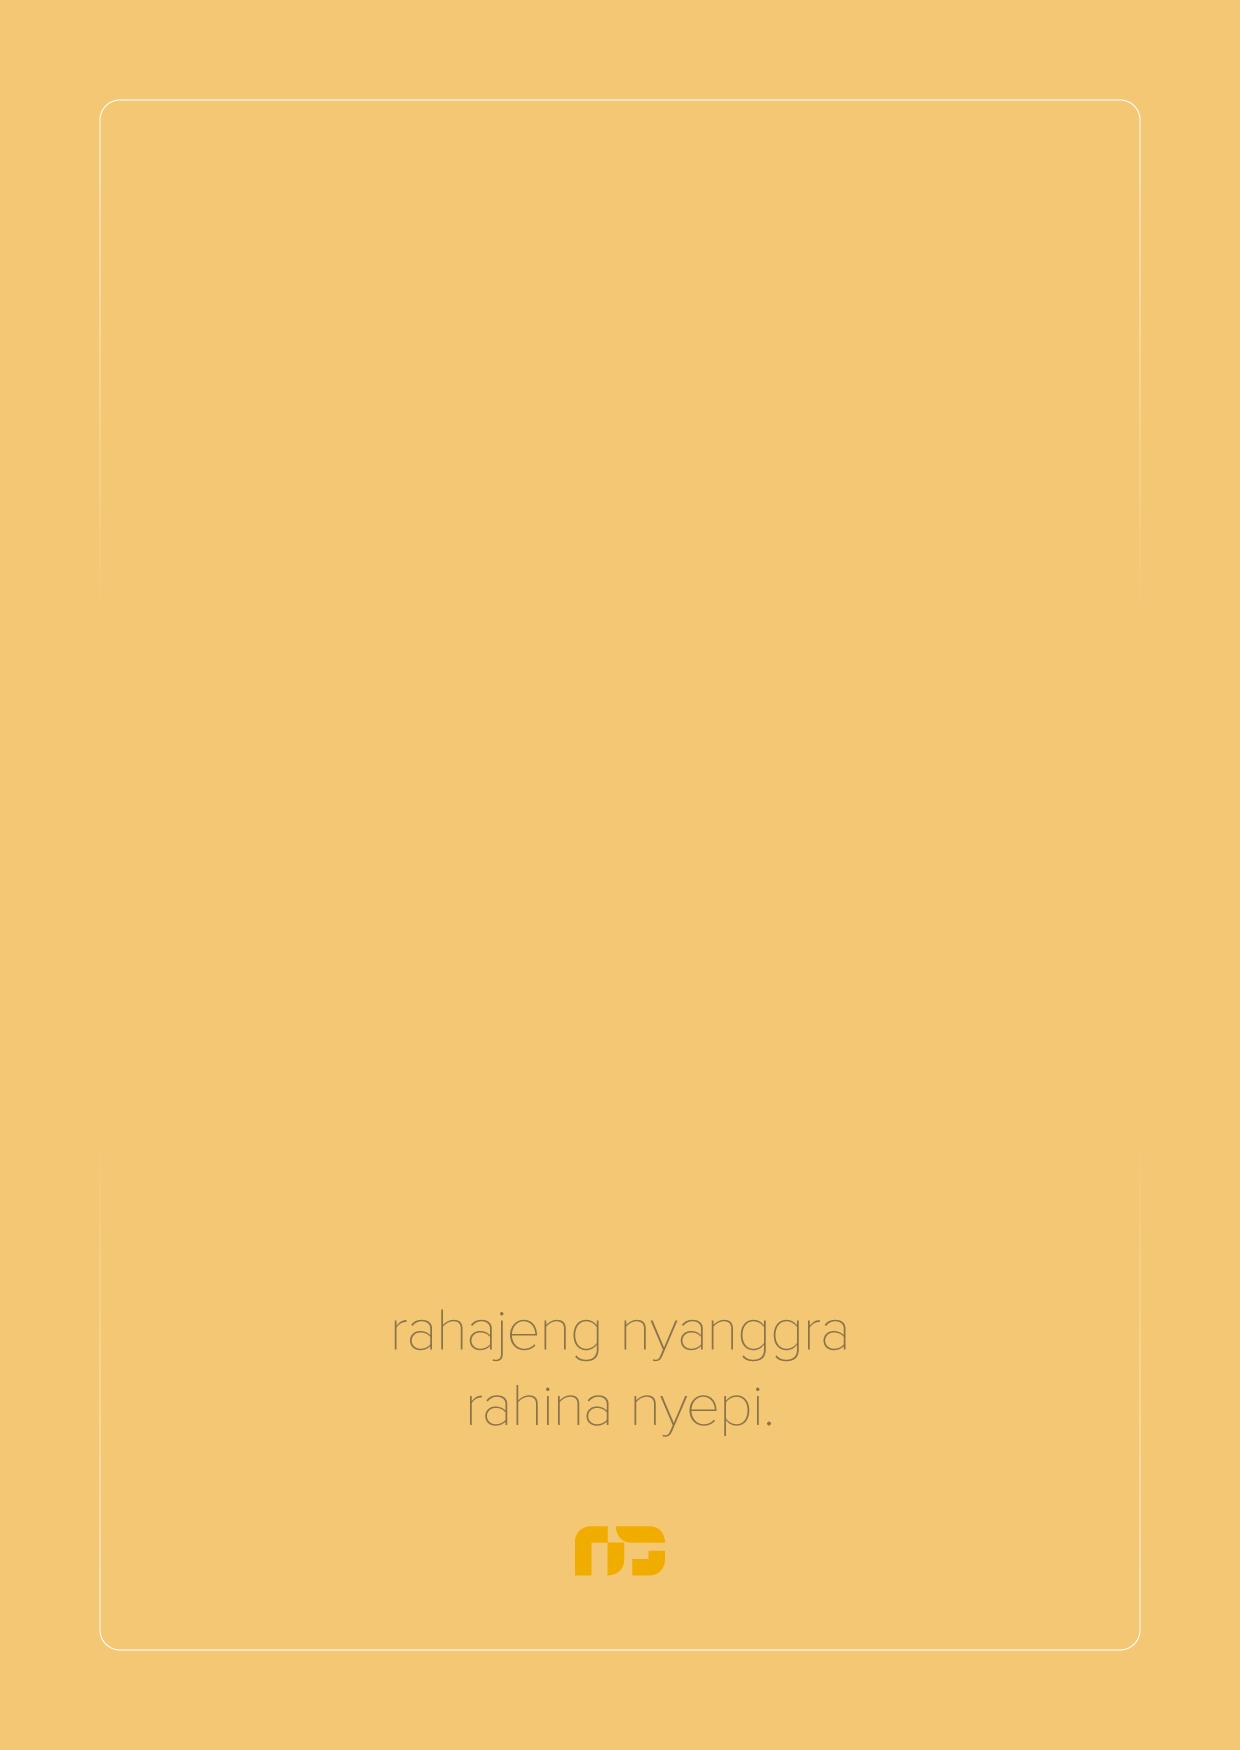 Rahajeng Nyanggra Rahina Nyepi